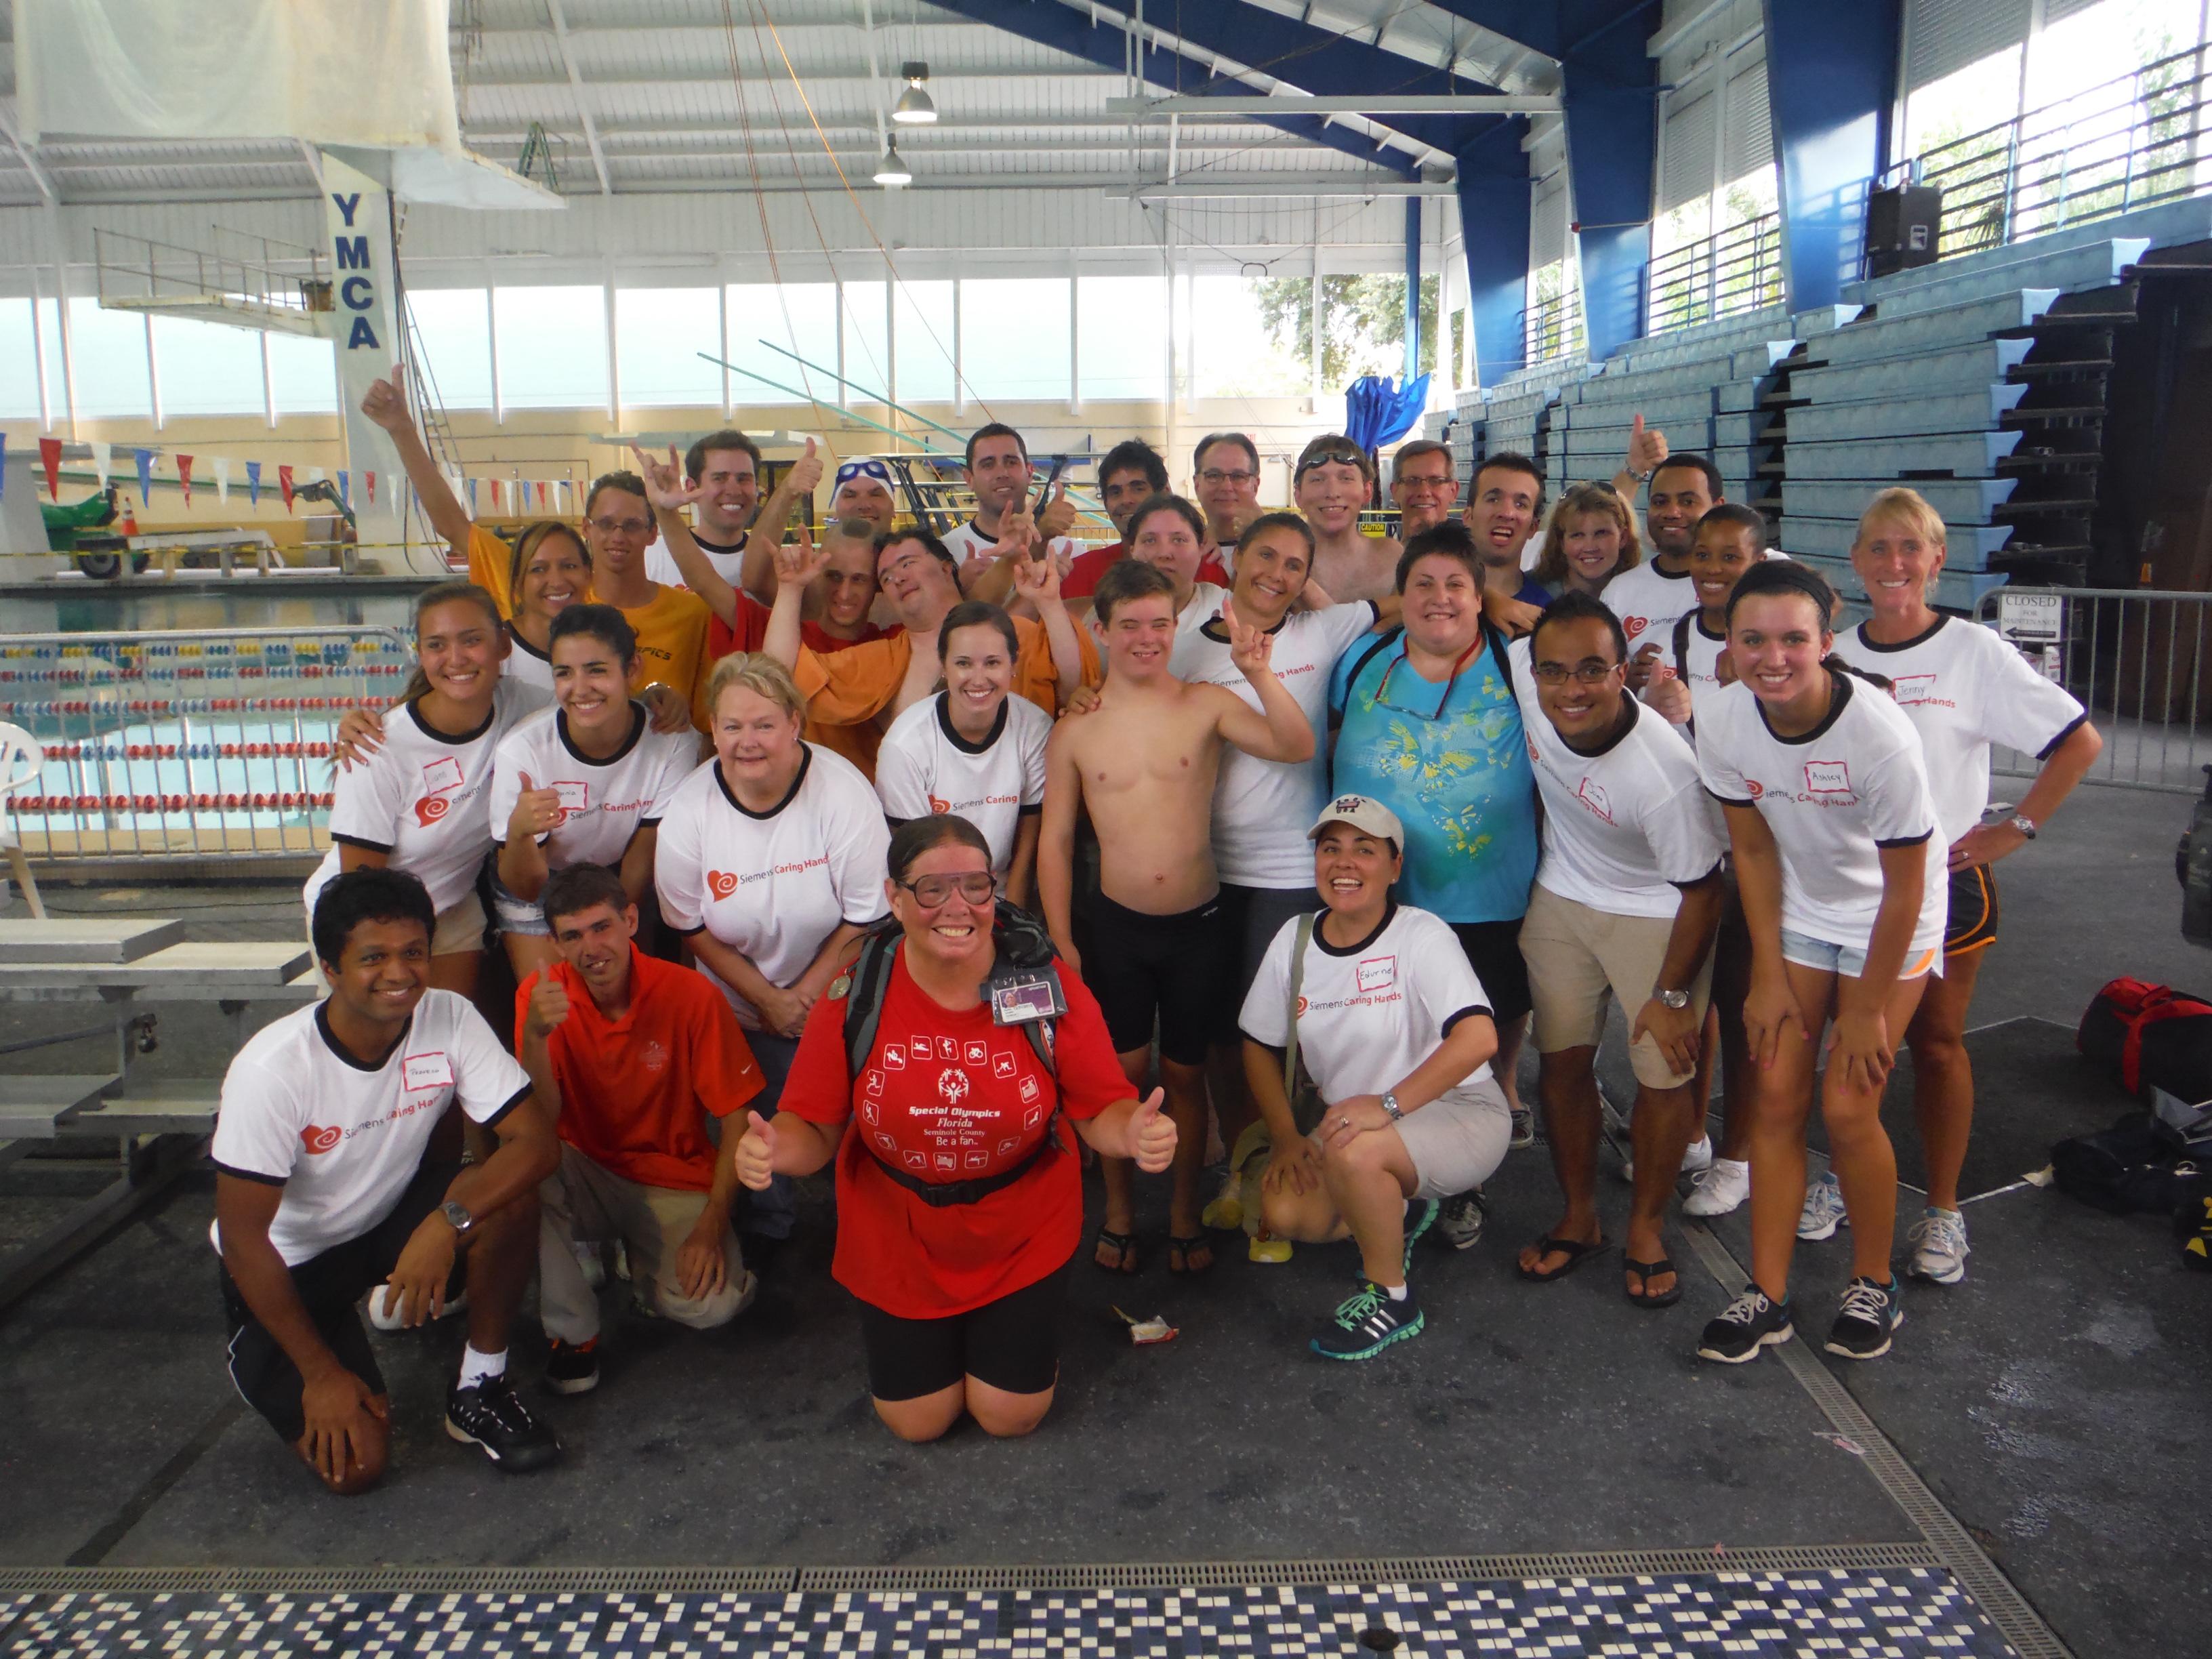 The Siemens volunteers did a fantastic job at the meet. We appreciate all their efforts at the meet!